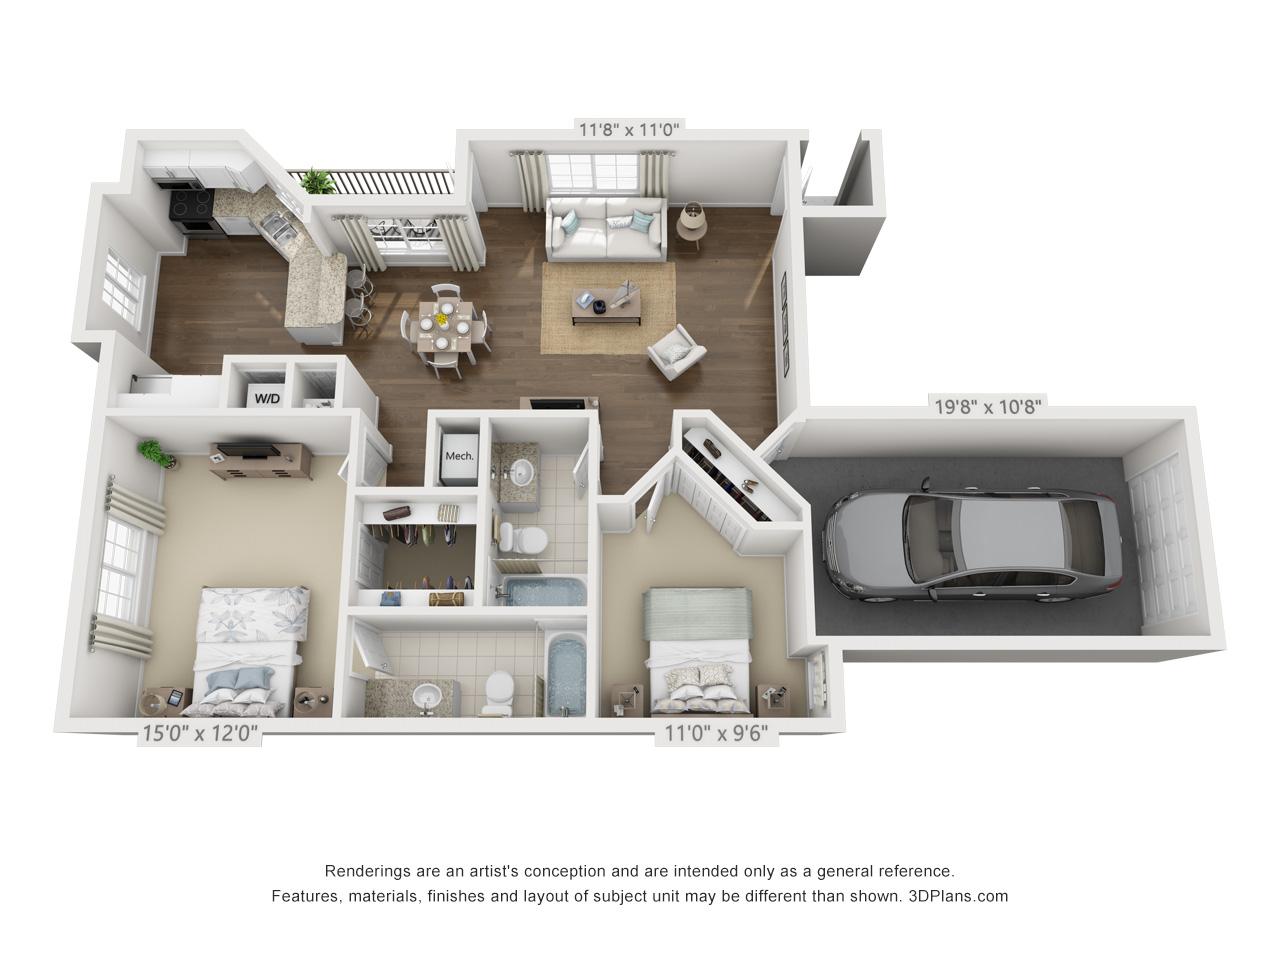 2 bedroom apartment in pembroke pines